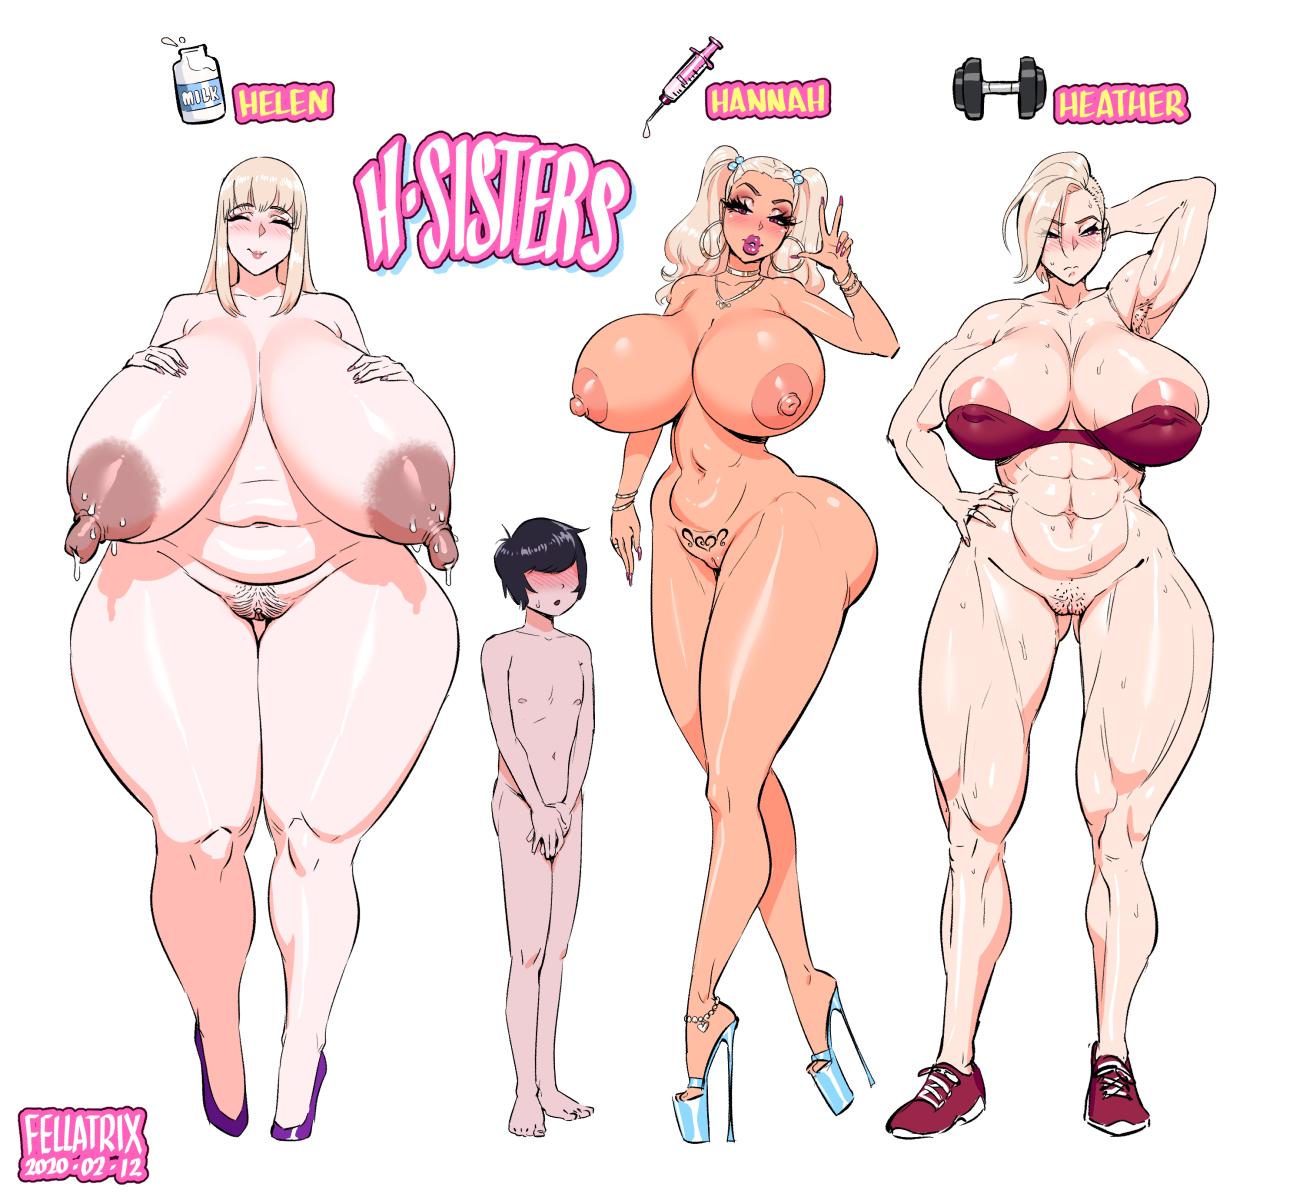 Fellatrix Heather S Workout Porn Comic Bellatrix was voldemort's right hand woman and most dedicated follower. porn comics free online